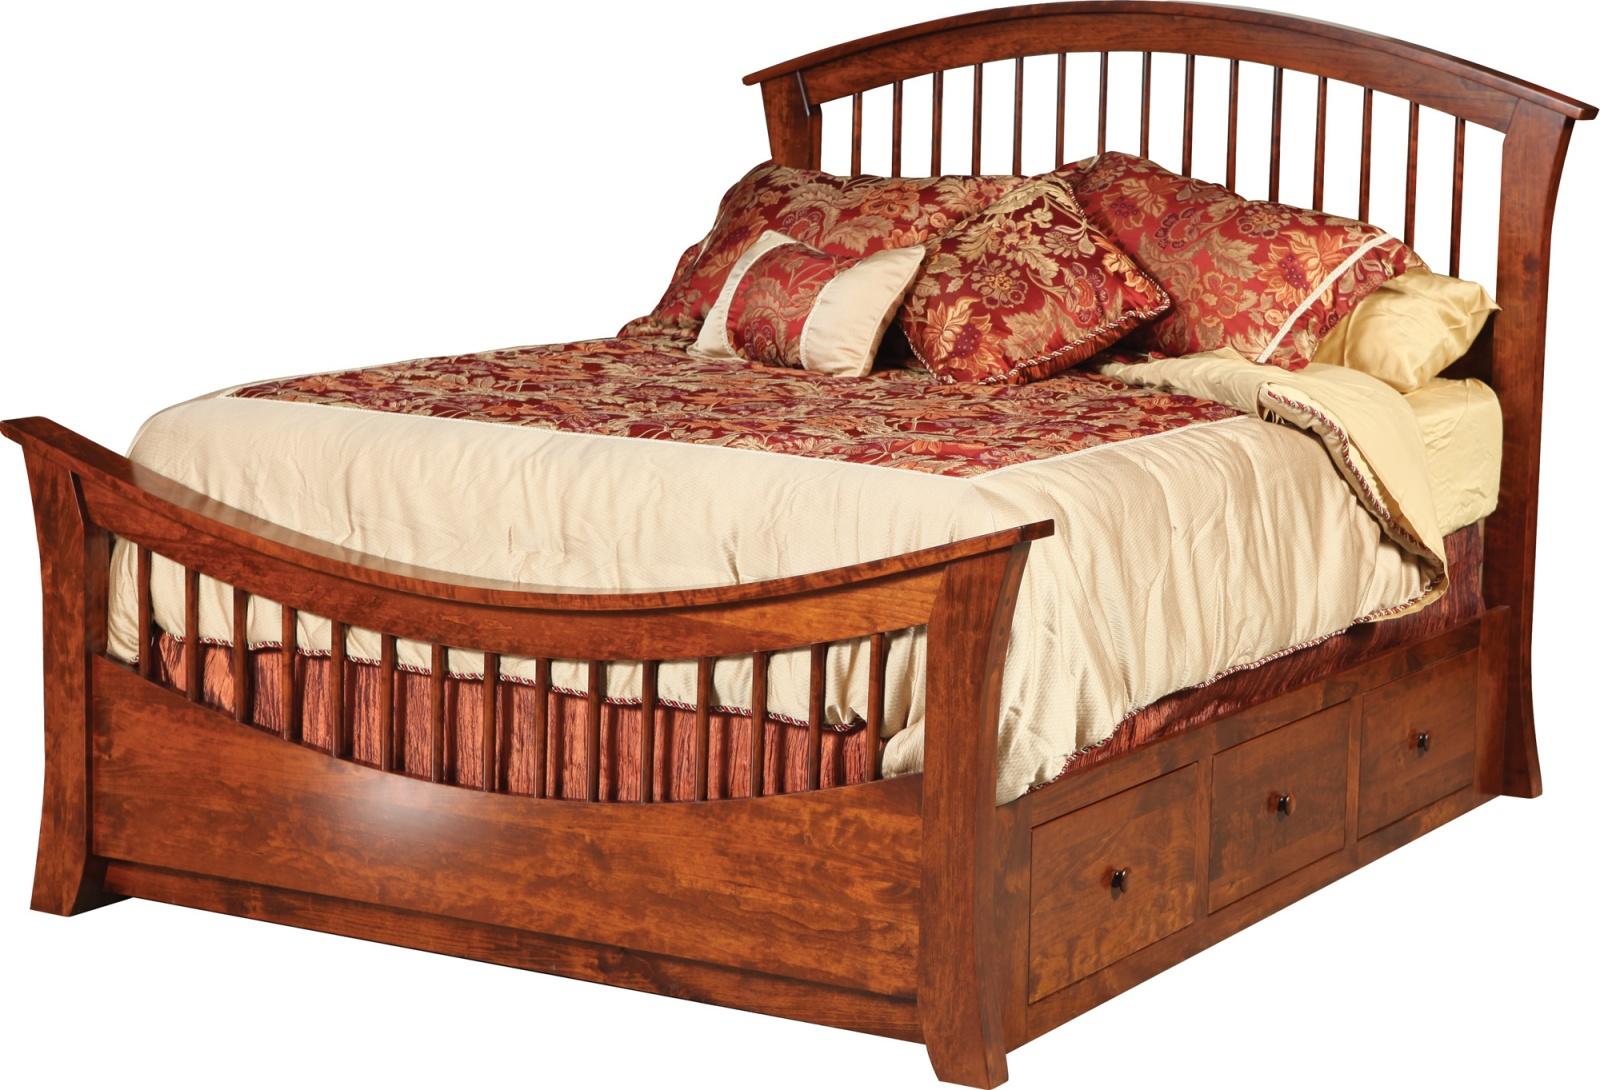 Rainbow Bed with Regular Footboard